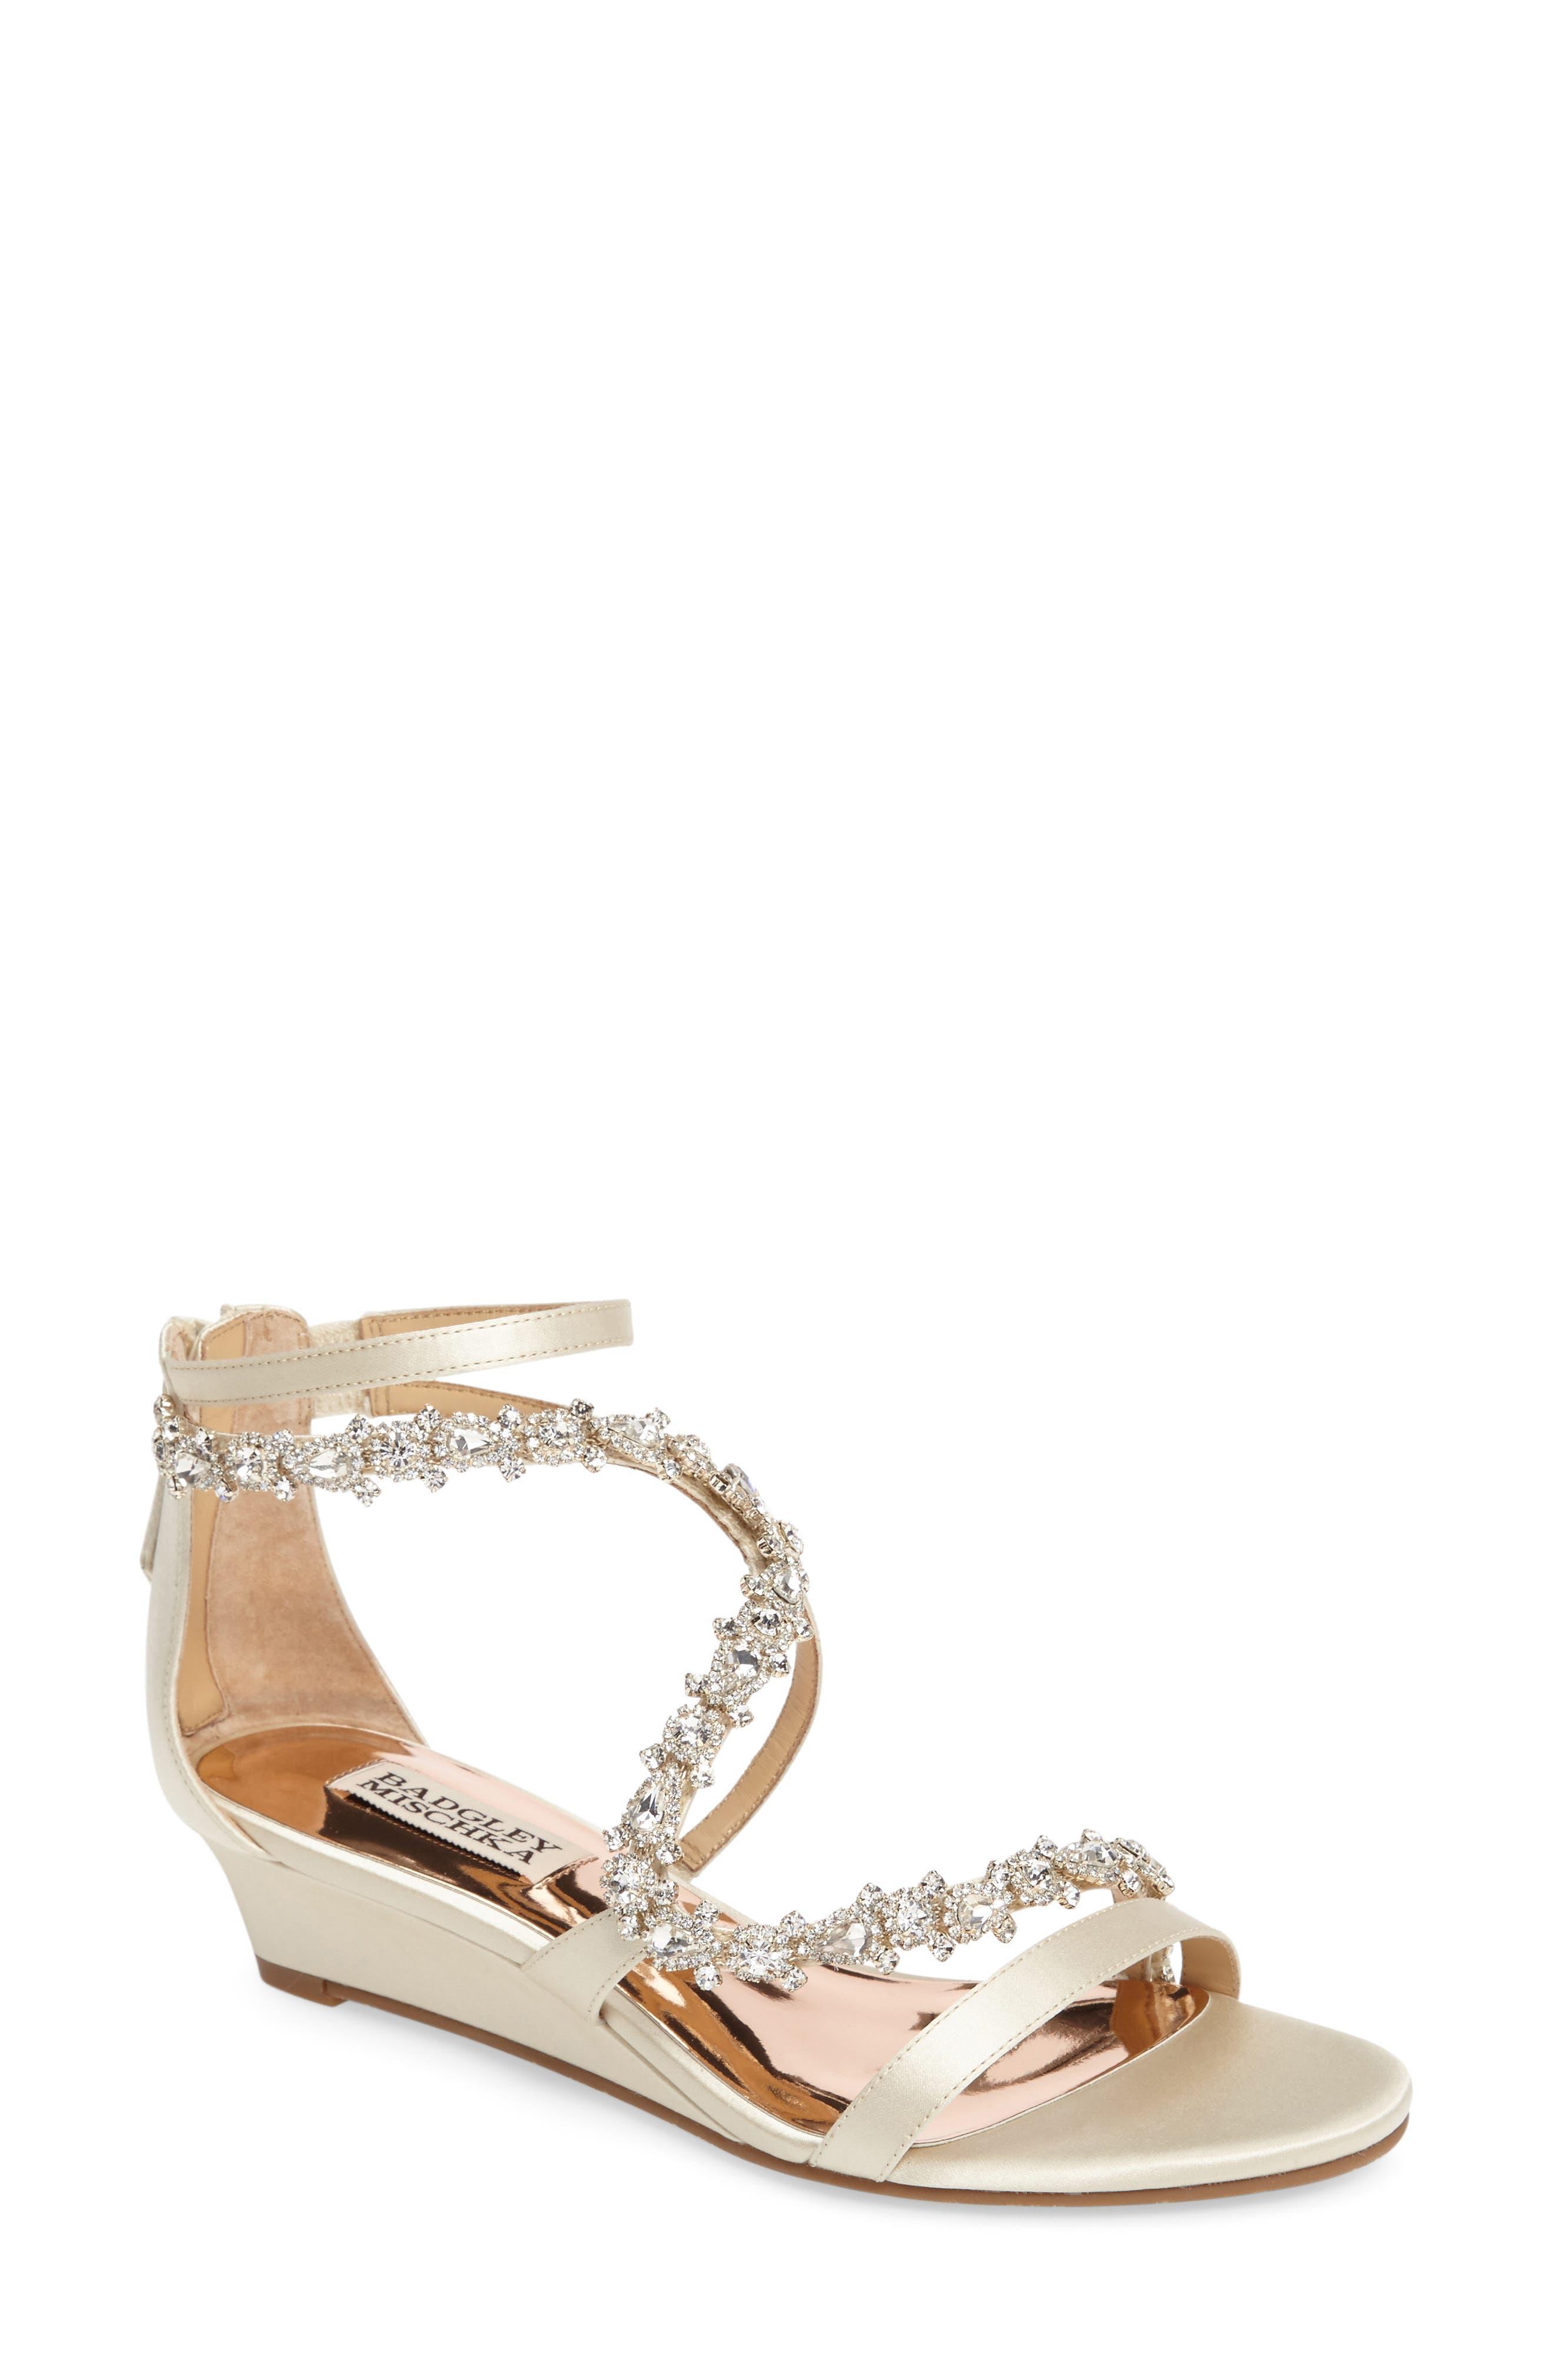 Badgley Mischka Belvedere Embellished Wedge Sandal (Women)